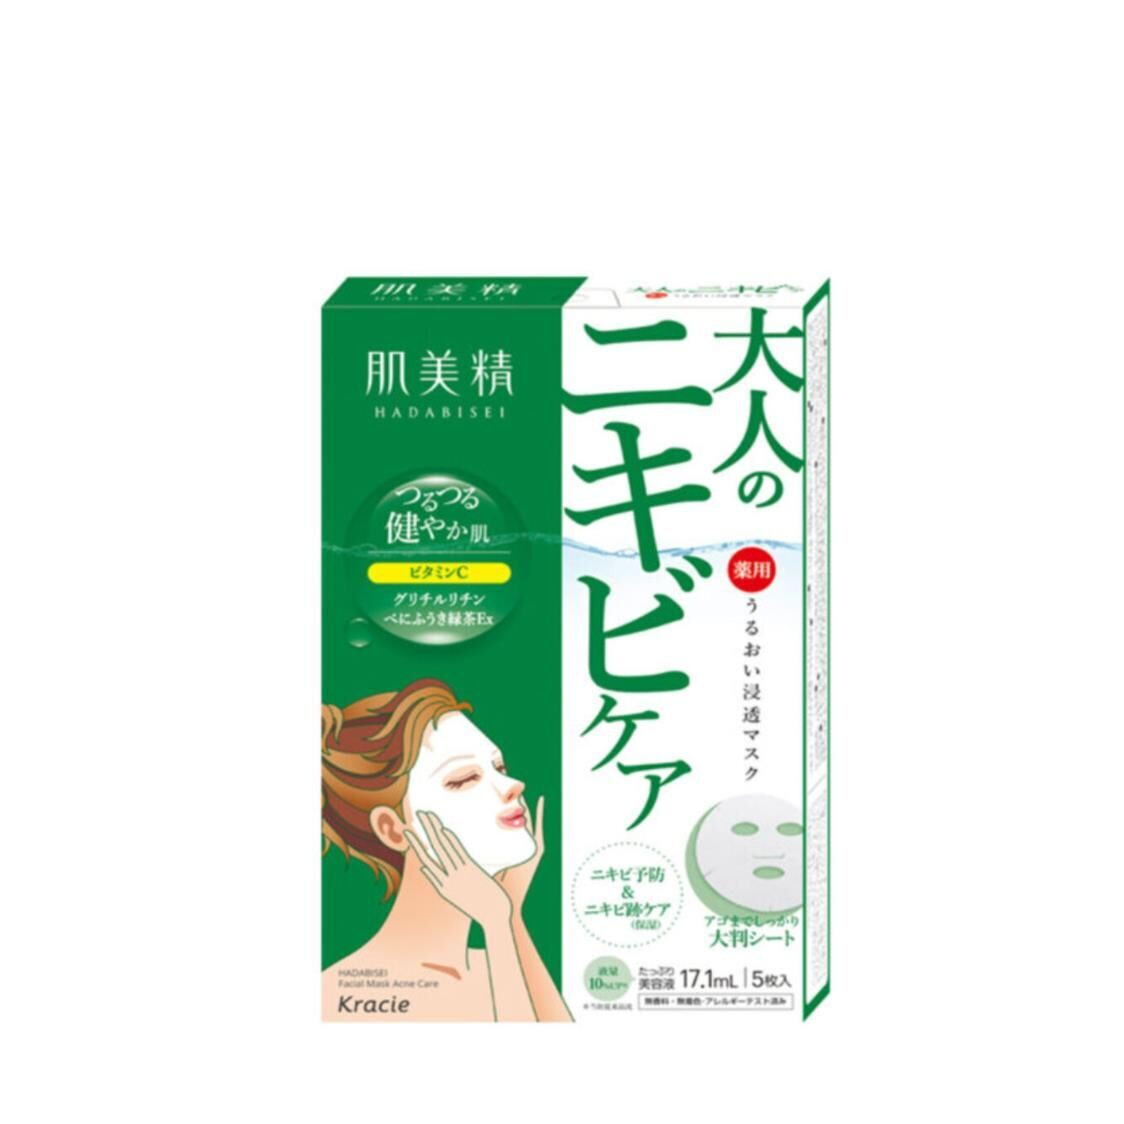 Hadabisei Moisturising Facial Mask Acne 5pc